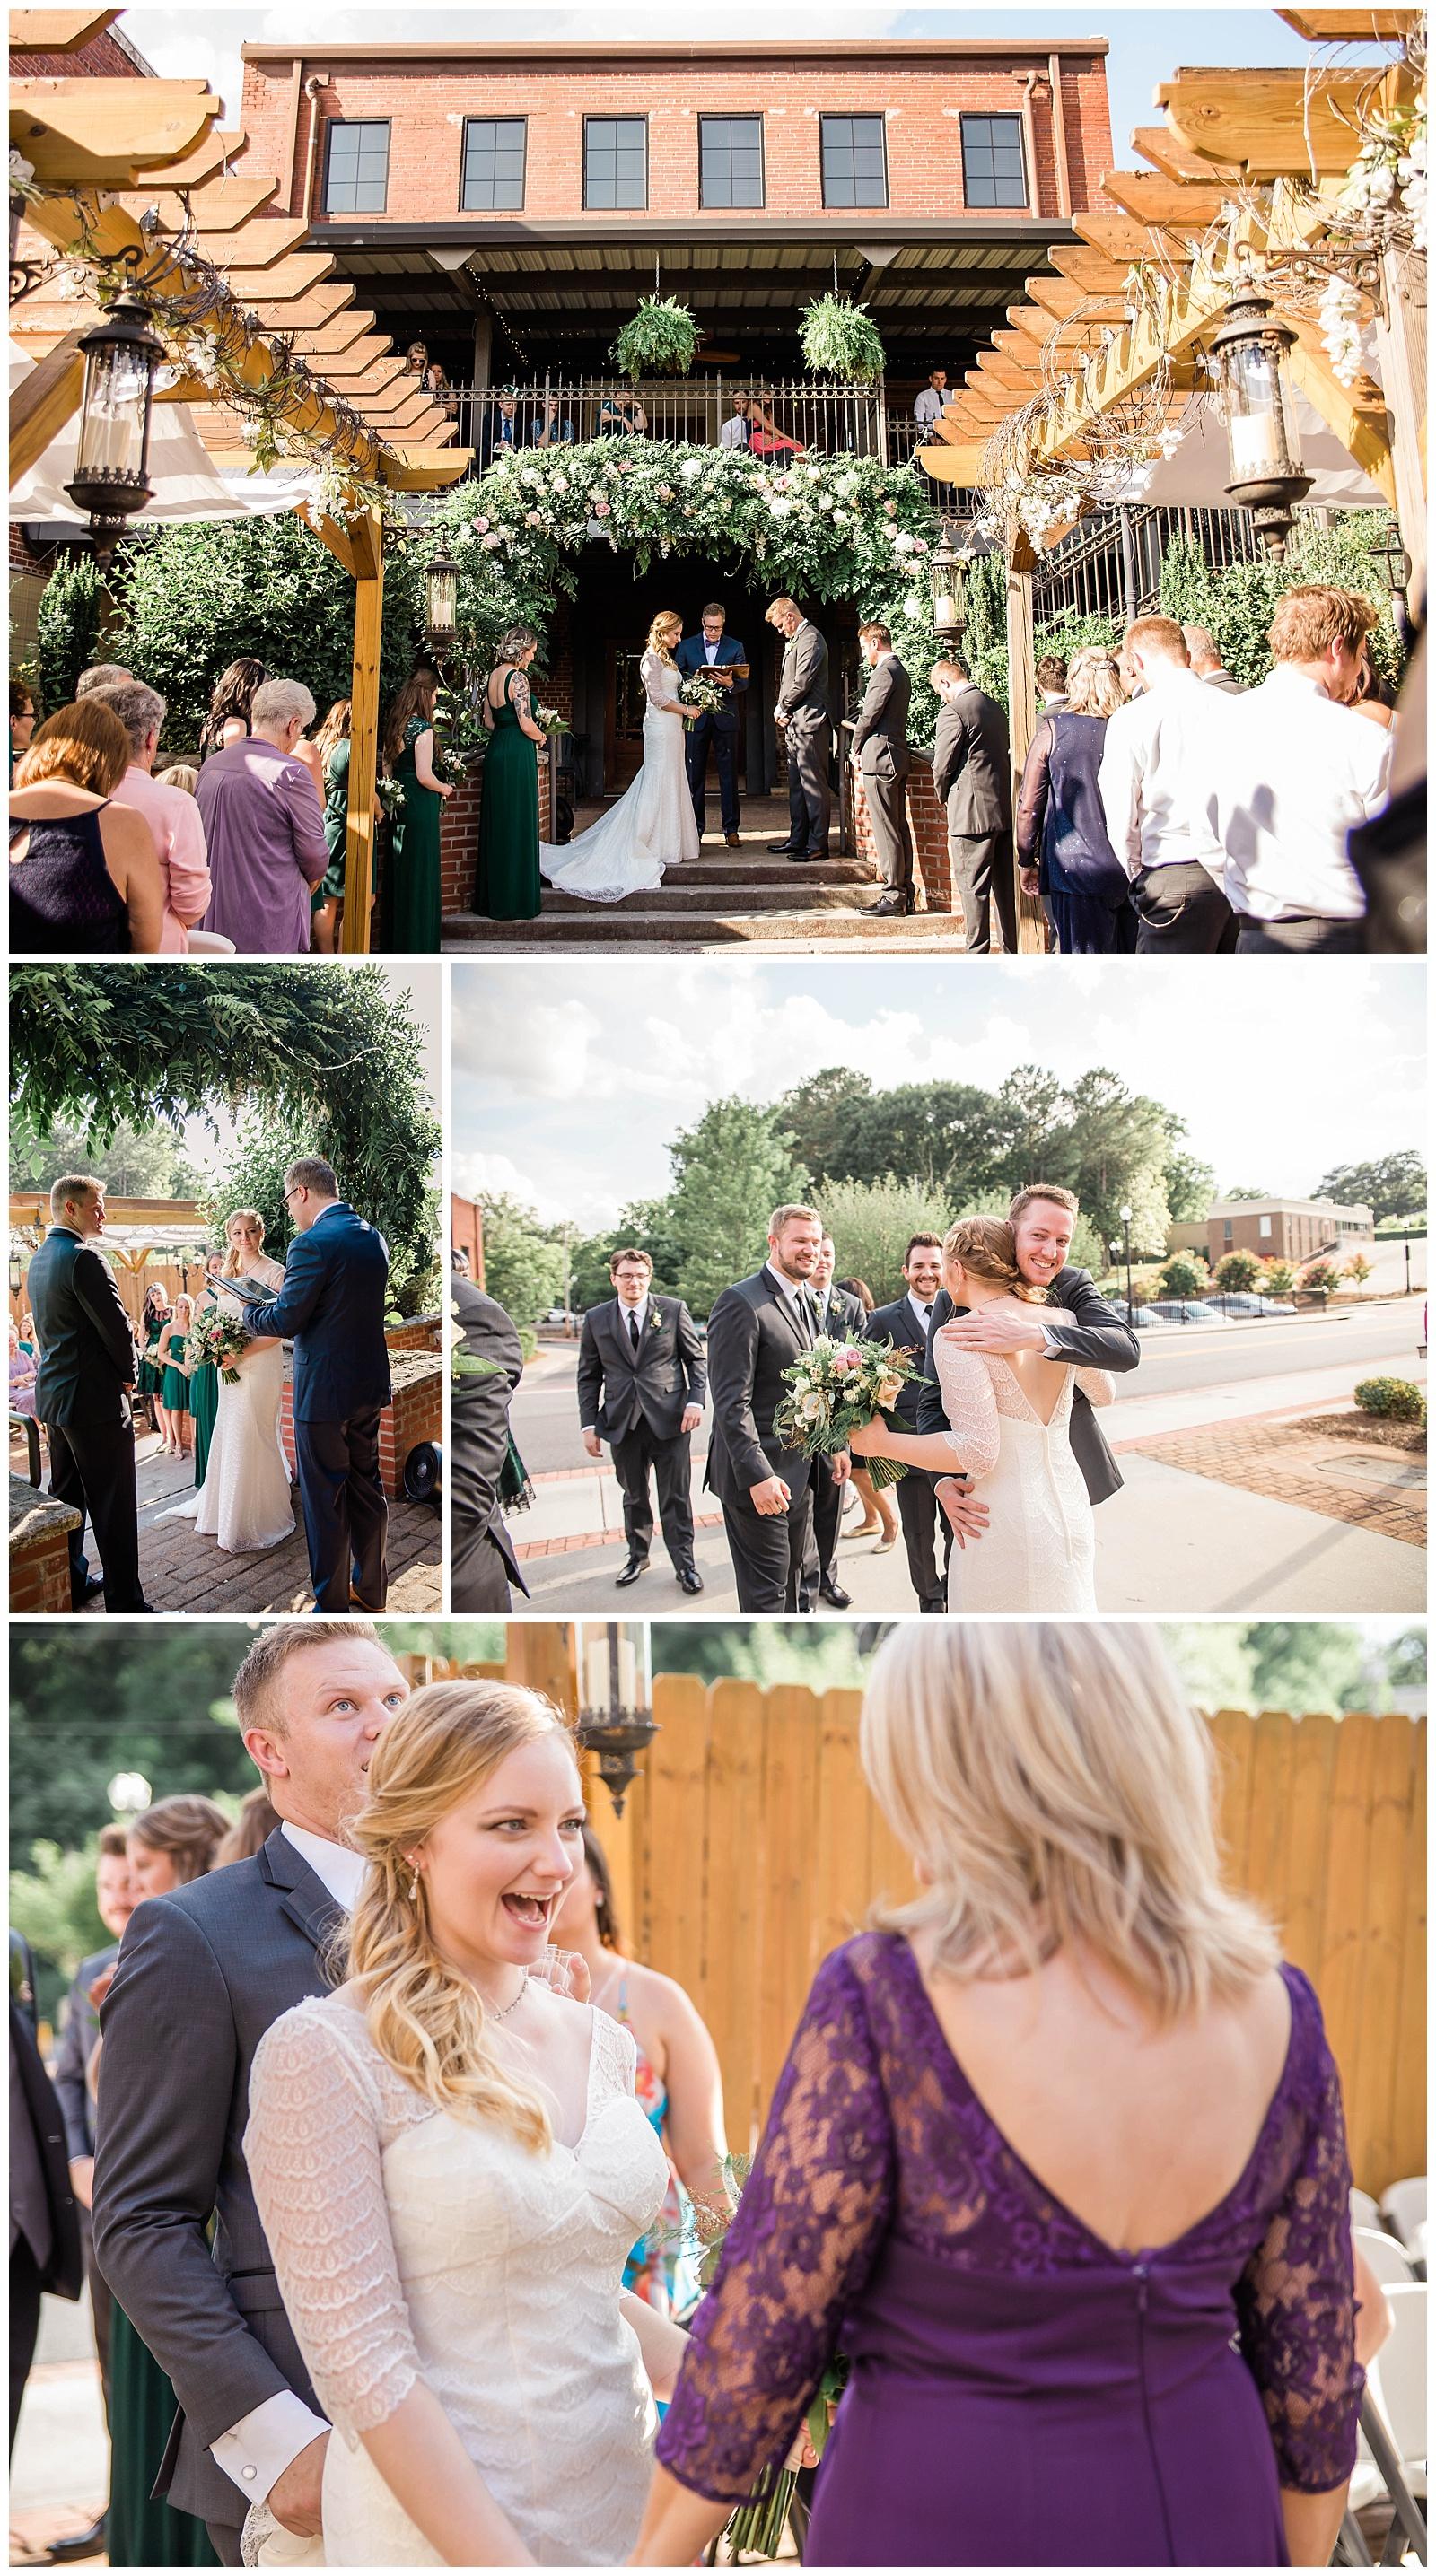 Bairdwedding_Acworth_TheConservatory-KaraBlakemanphotography_2017_17